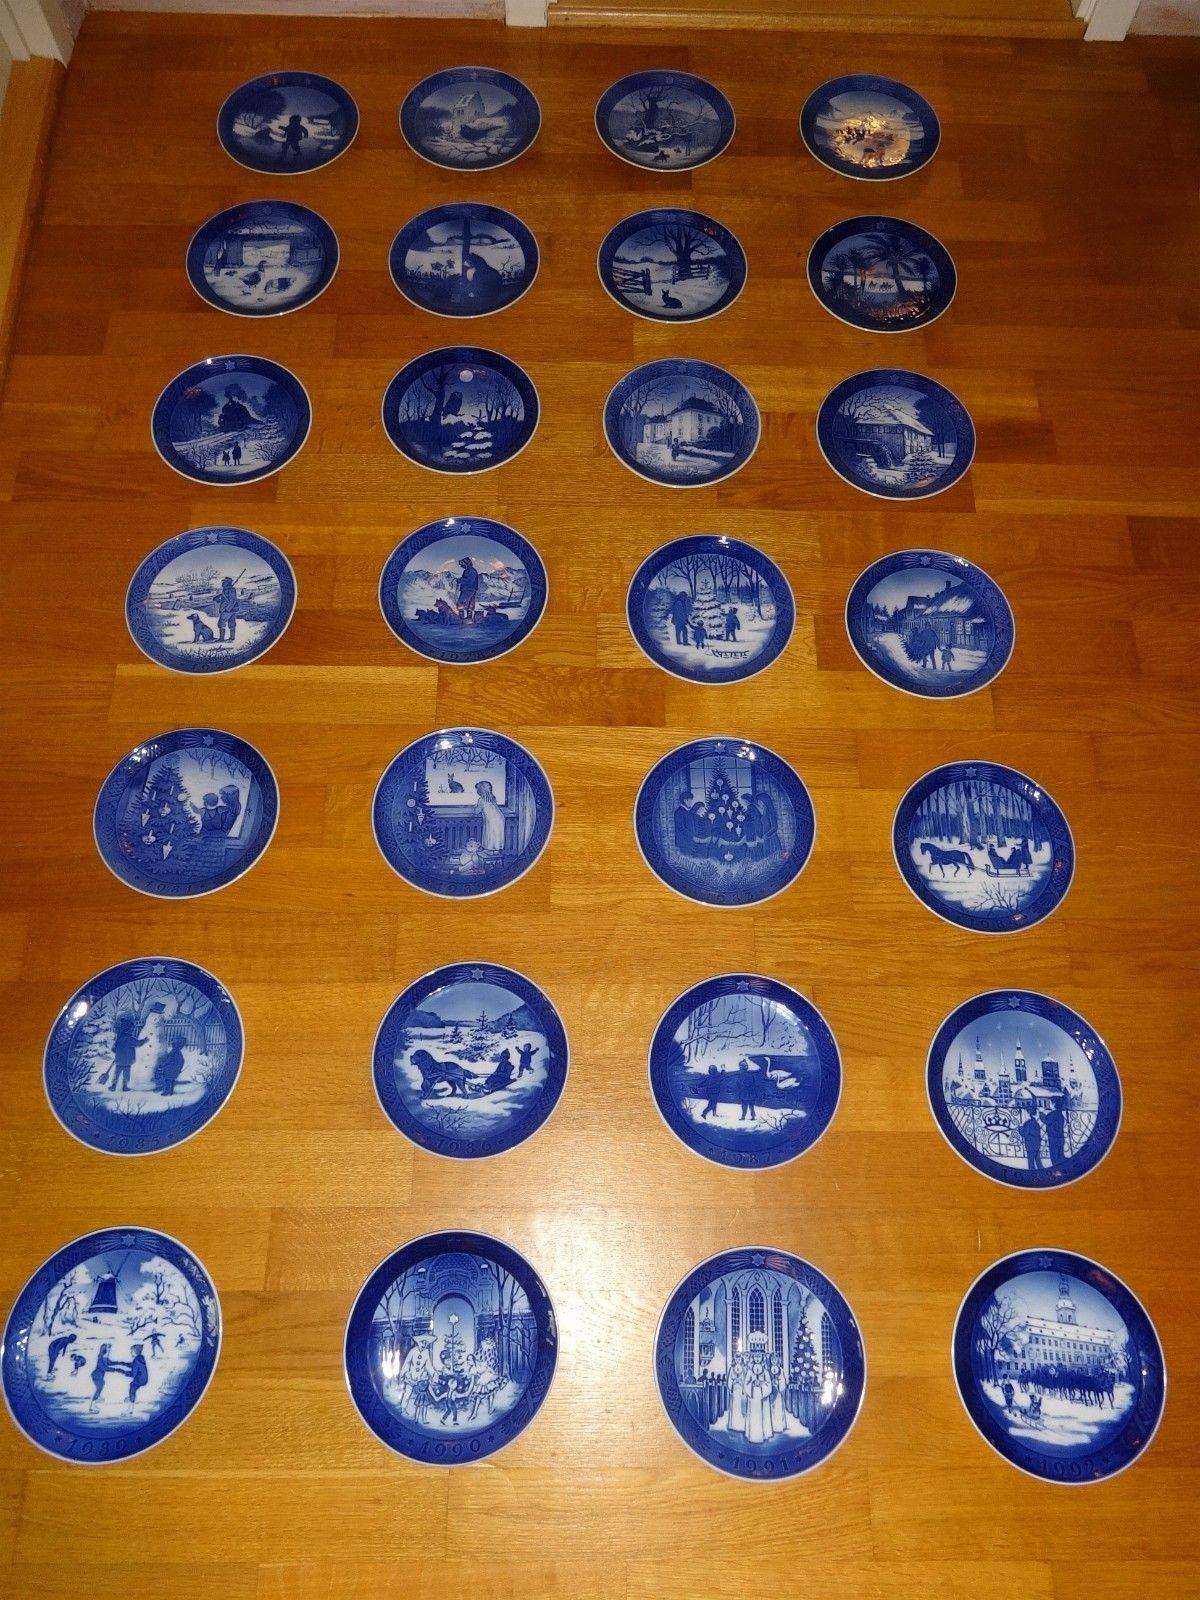 28 stk juleplatter Royal Copenhagen 1965-1992 - Rykkinn  - 28 stk juleplatter Royal Copenhagen 1965-1992 selges samlet for kr. 1.800,-  Evt. kr. 75,- pr. stk - Rykkinn